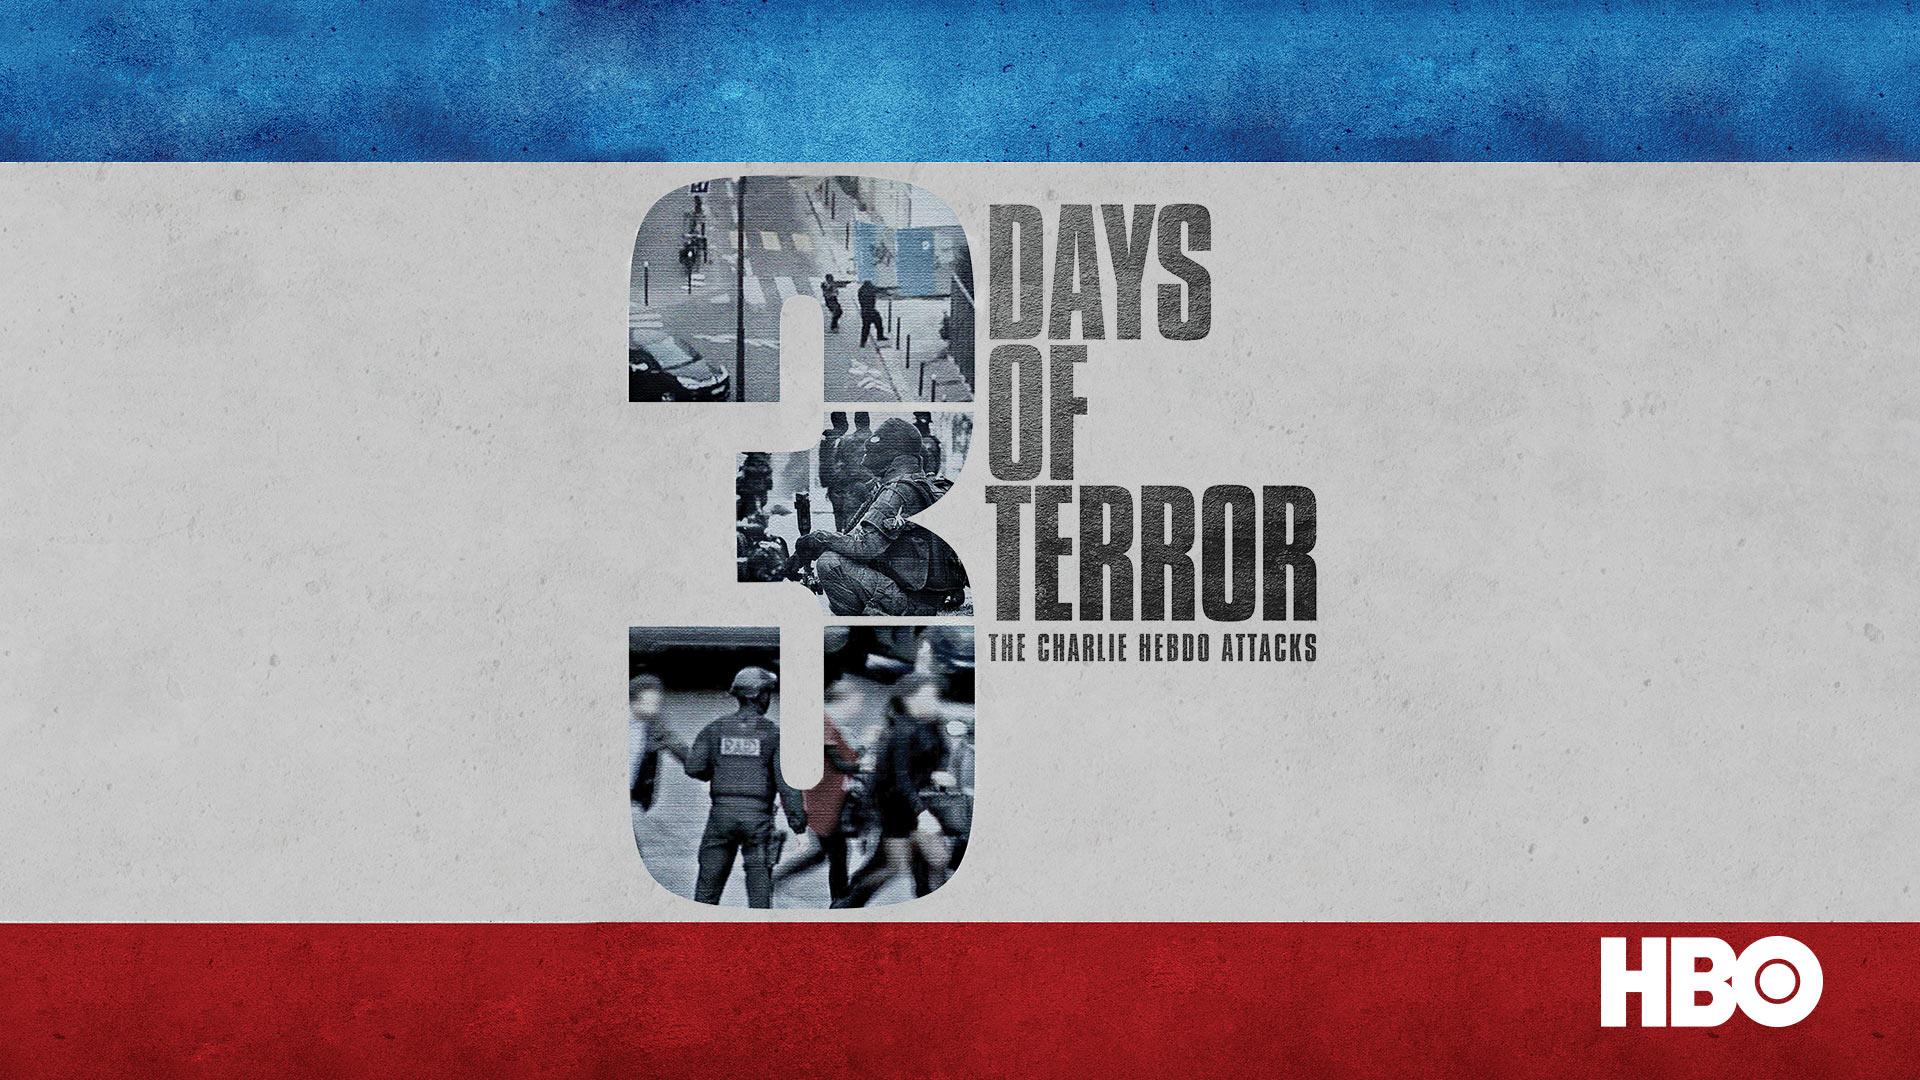 Three Days of Terror: The Charlie Hebdo Attacks(English Subtitled)